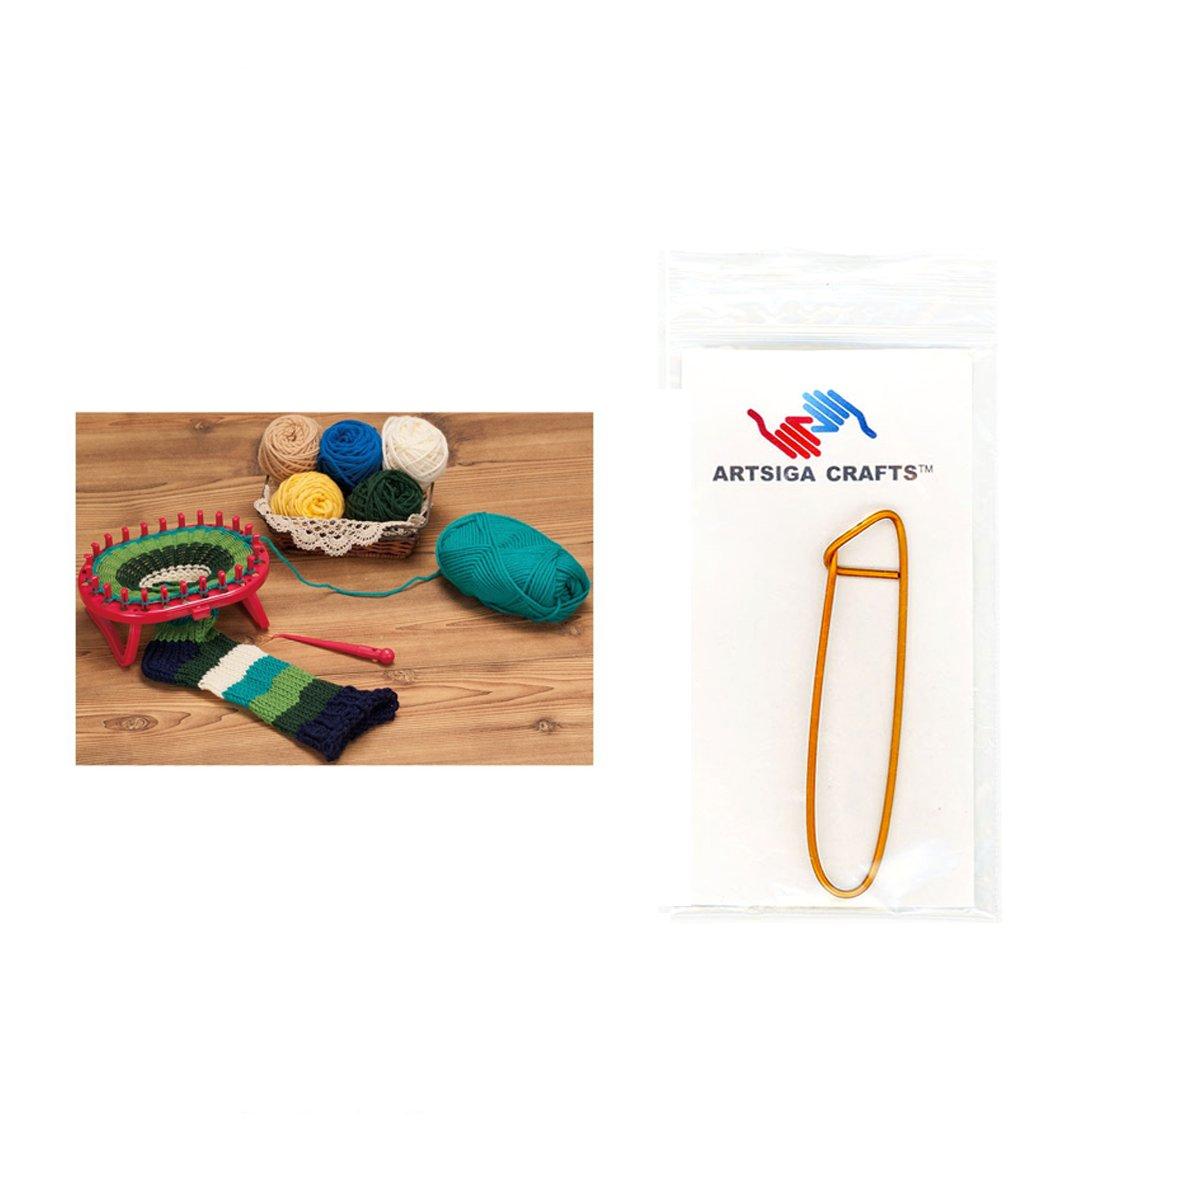 Clover Needlecraft Standing Oval Knitting Loom Bundle with 1 Artsiga Crafts Stitch Holder 3178